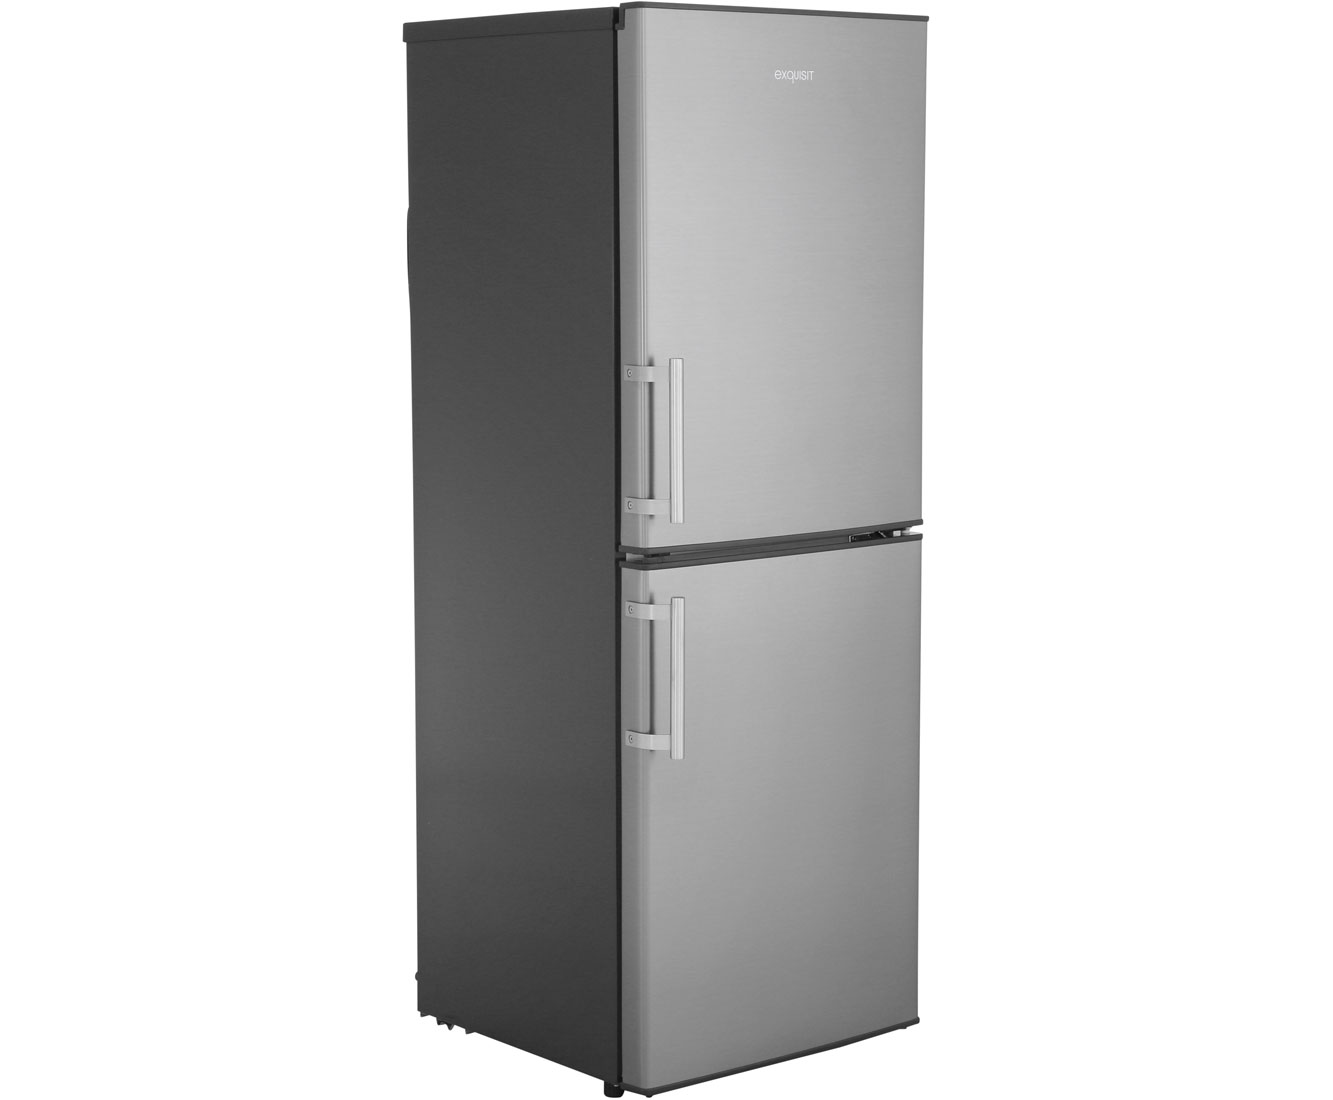 Retro Kühlschrank Oranier : Kühlschrank kombi siemens ka nlb side by side kühl gefrier